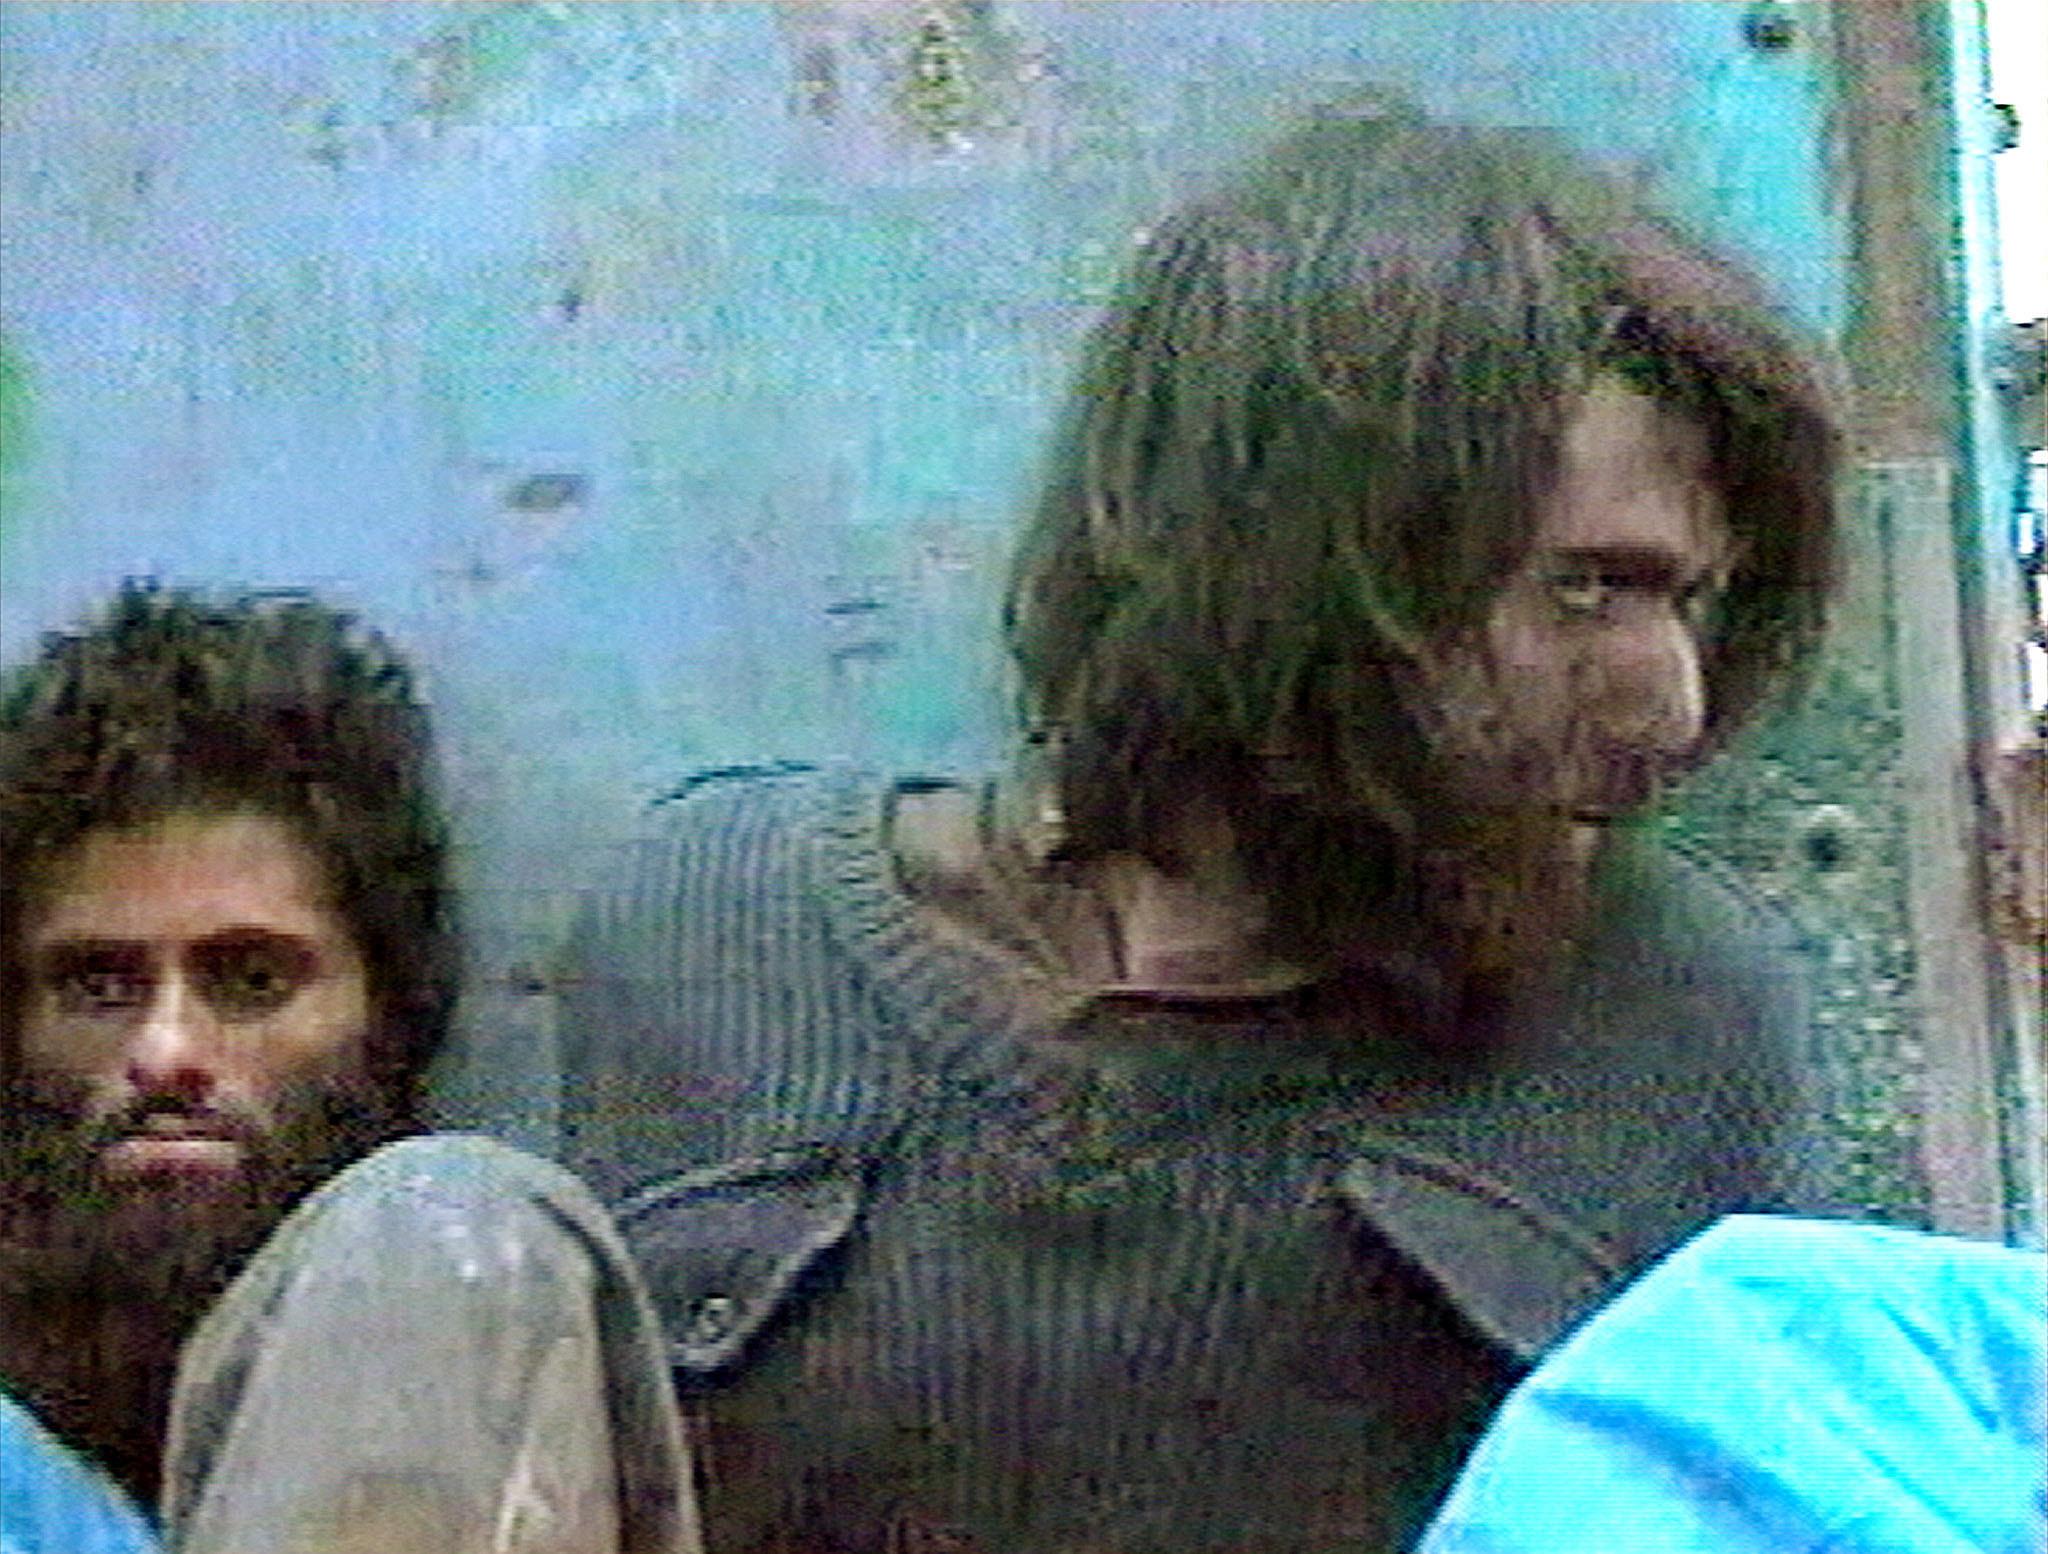 'American Taliban' John Walker Lindh to be released